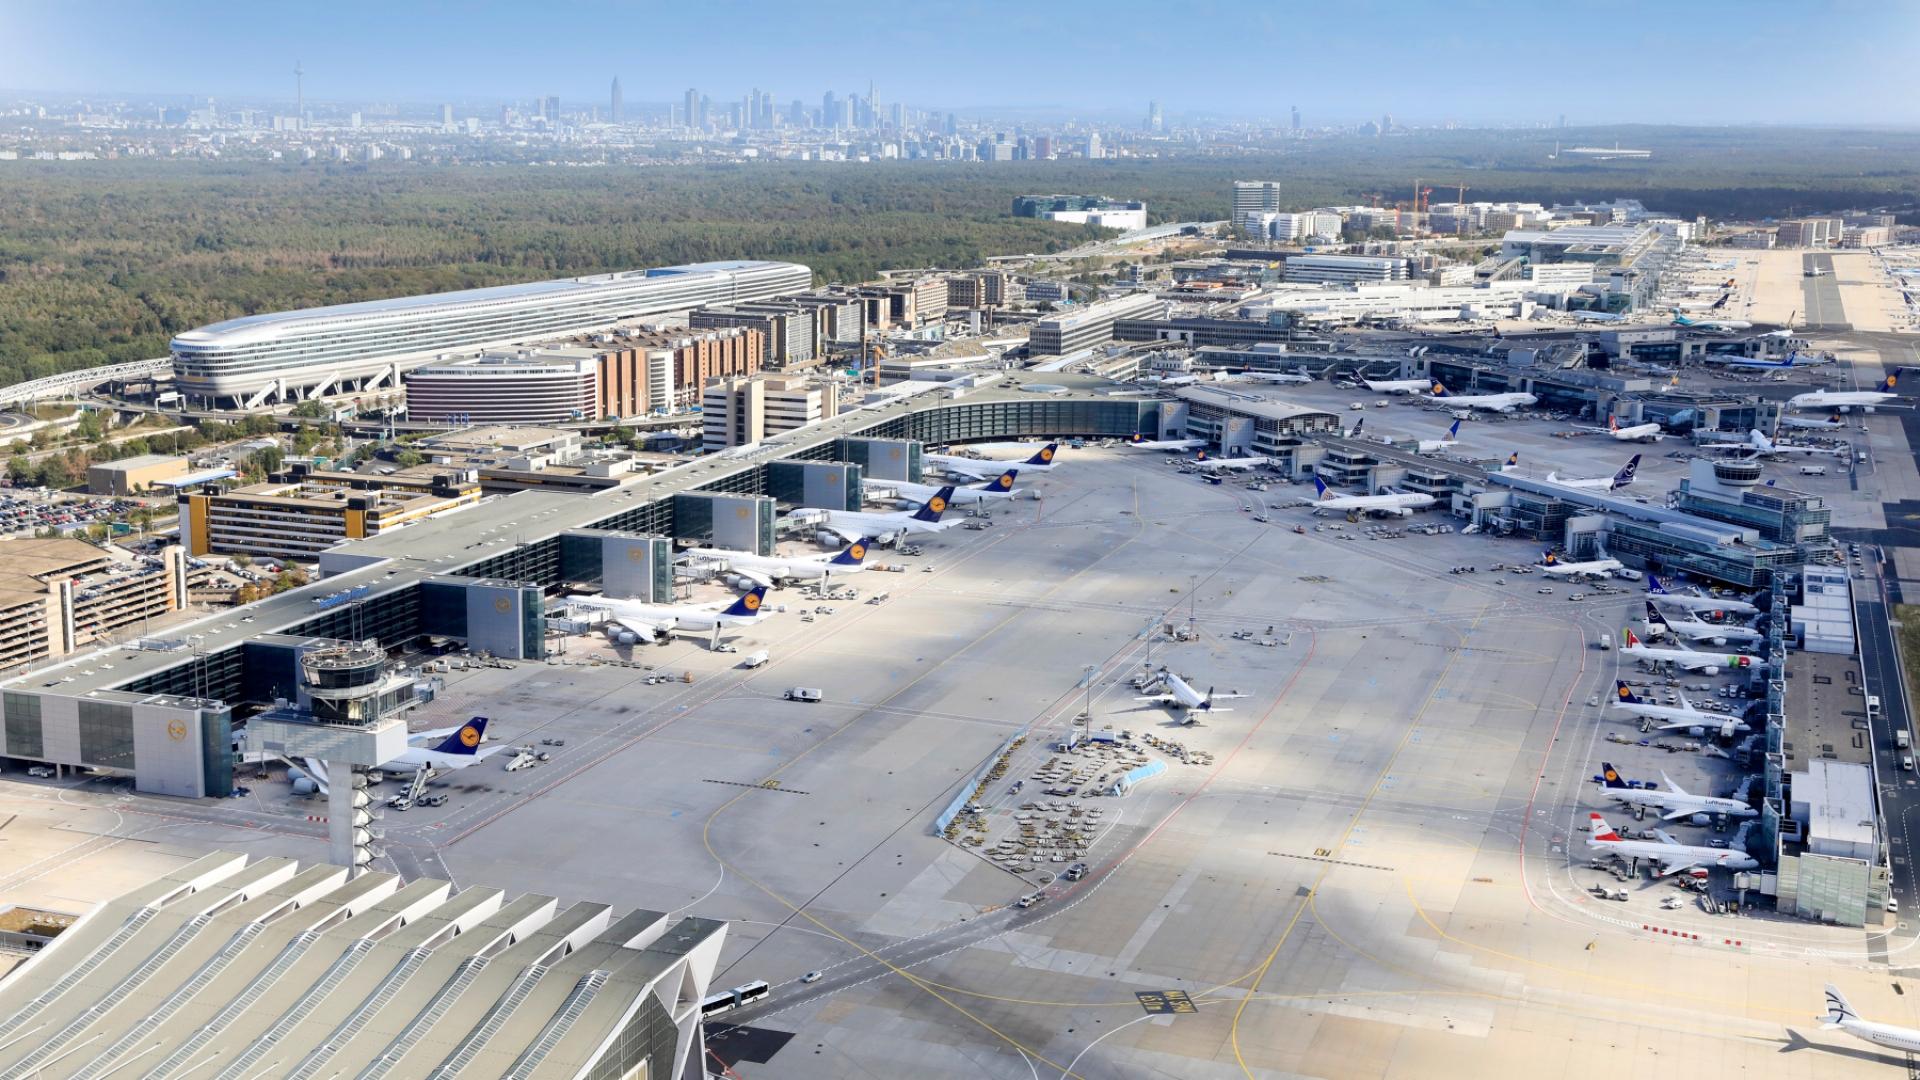 Major decline in passenger traffic continues at Frankfurt Airport in November 2020